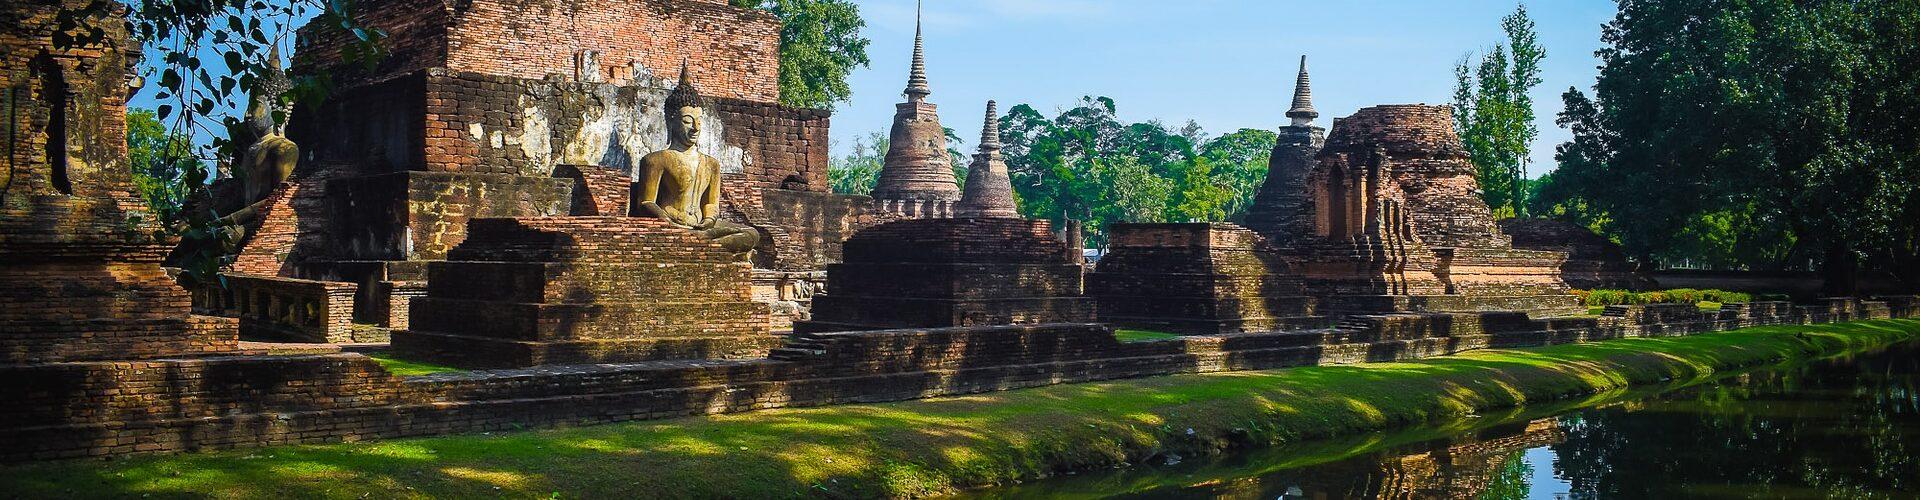 thailand - sukhothai - historical park